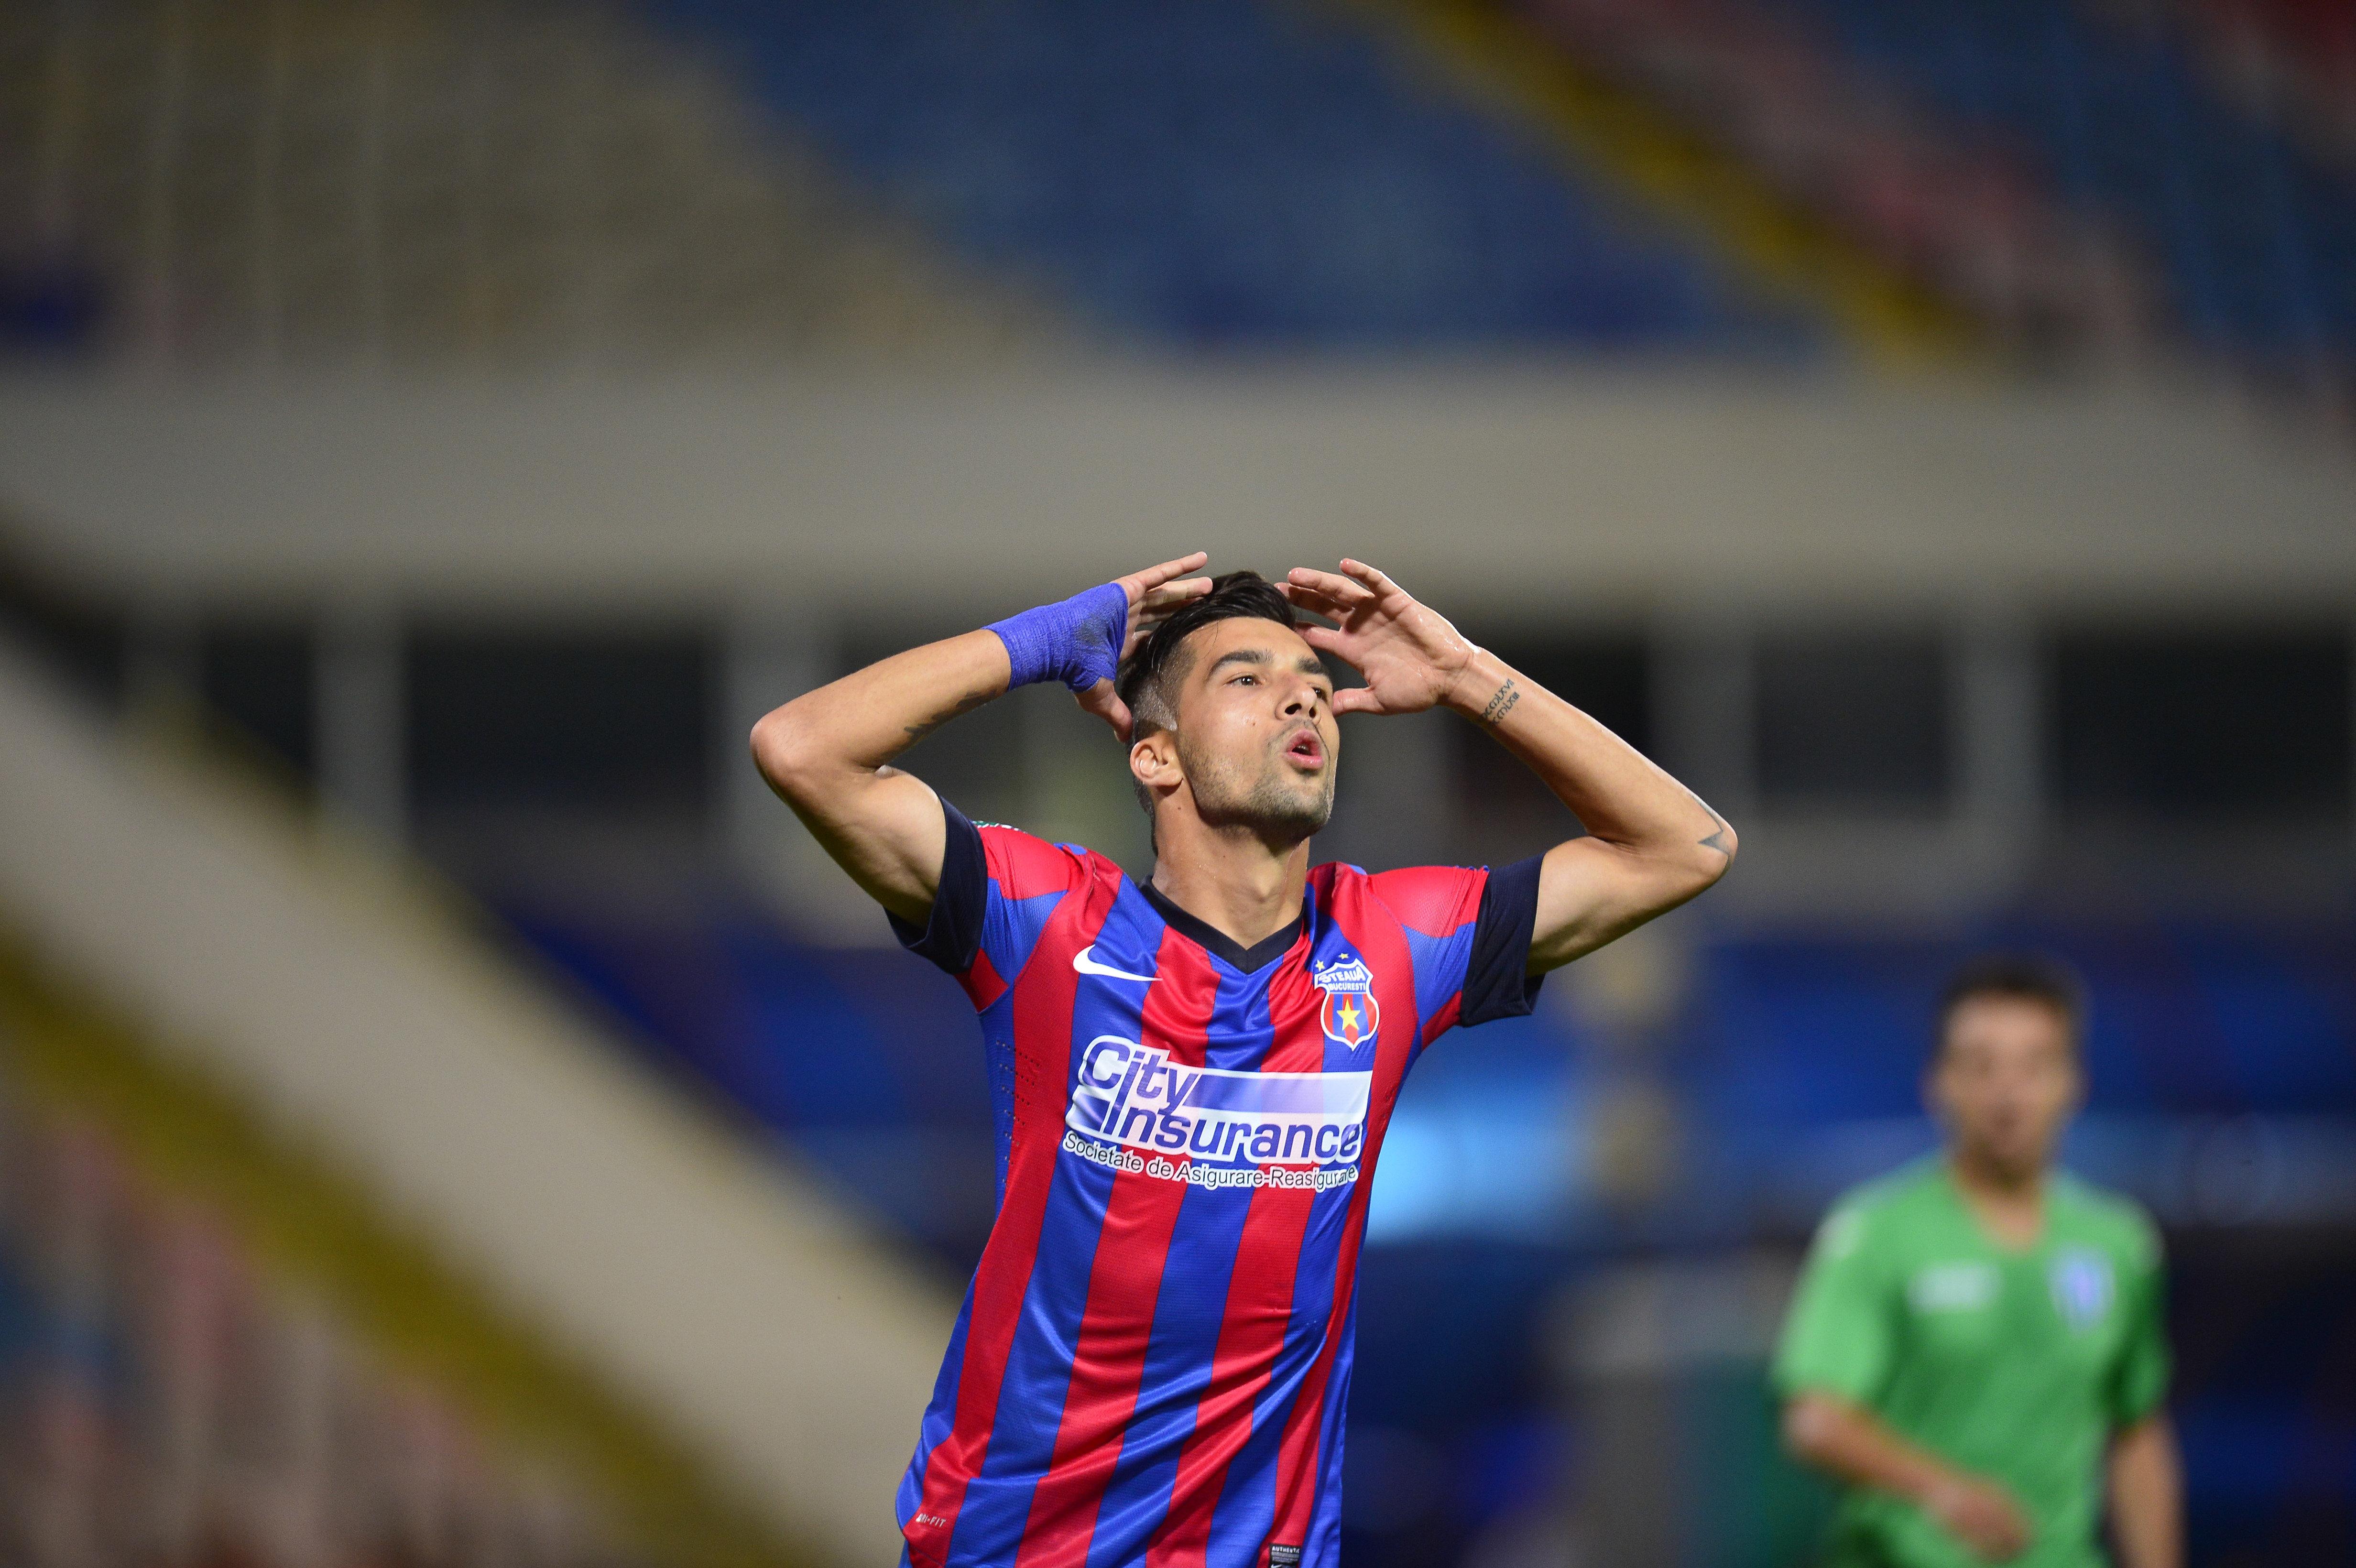 Paul P�rvulescu a fost �mprumutat de Steaua la Gaz Metan Medias